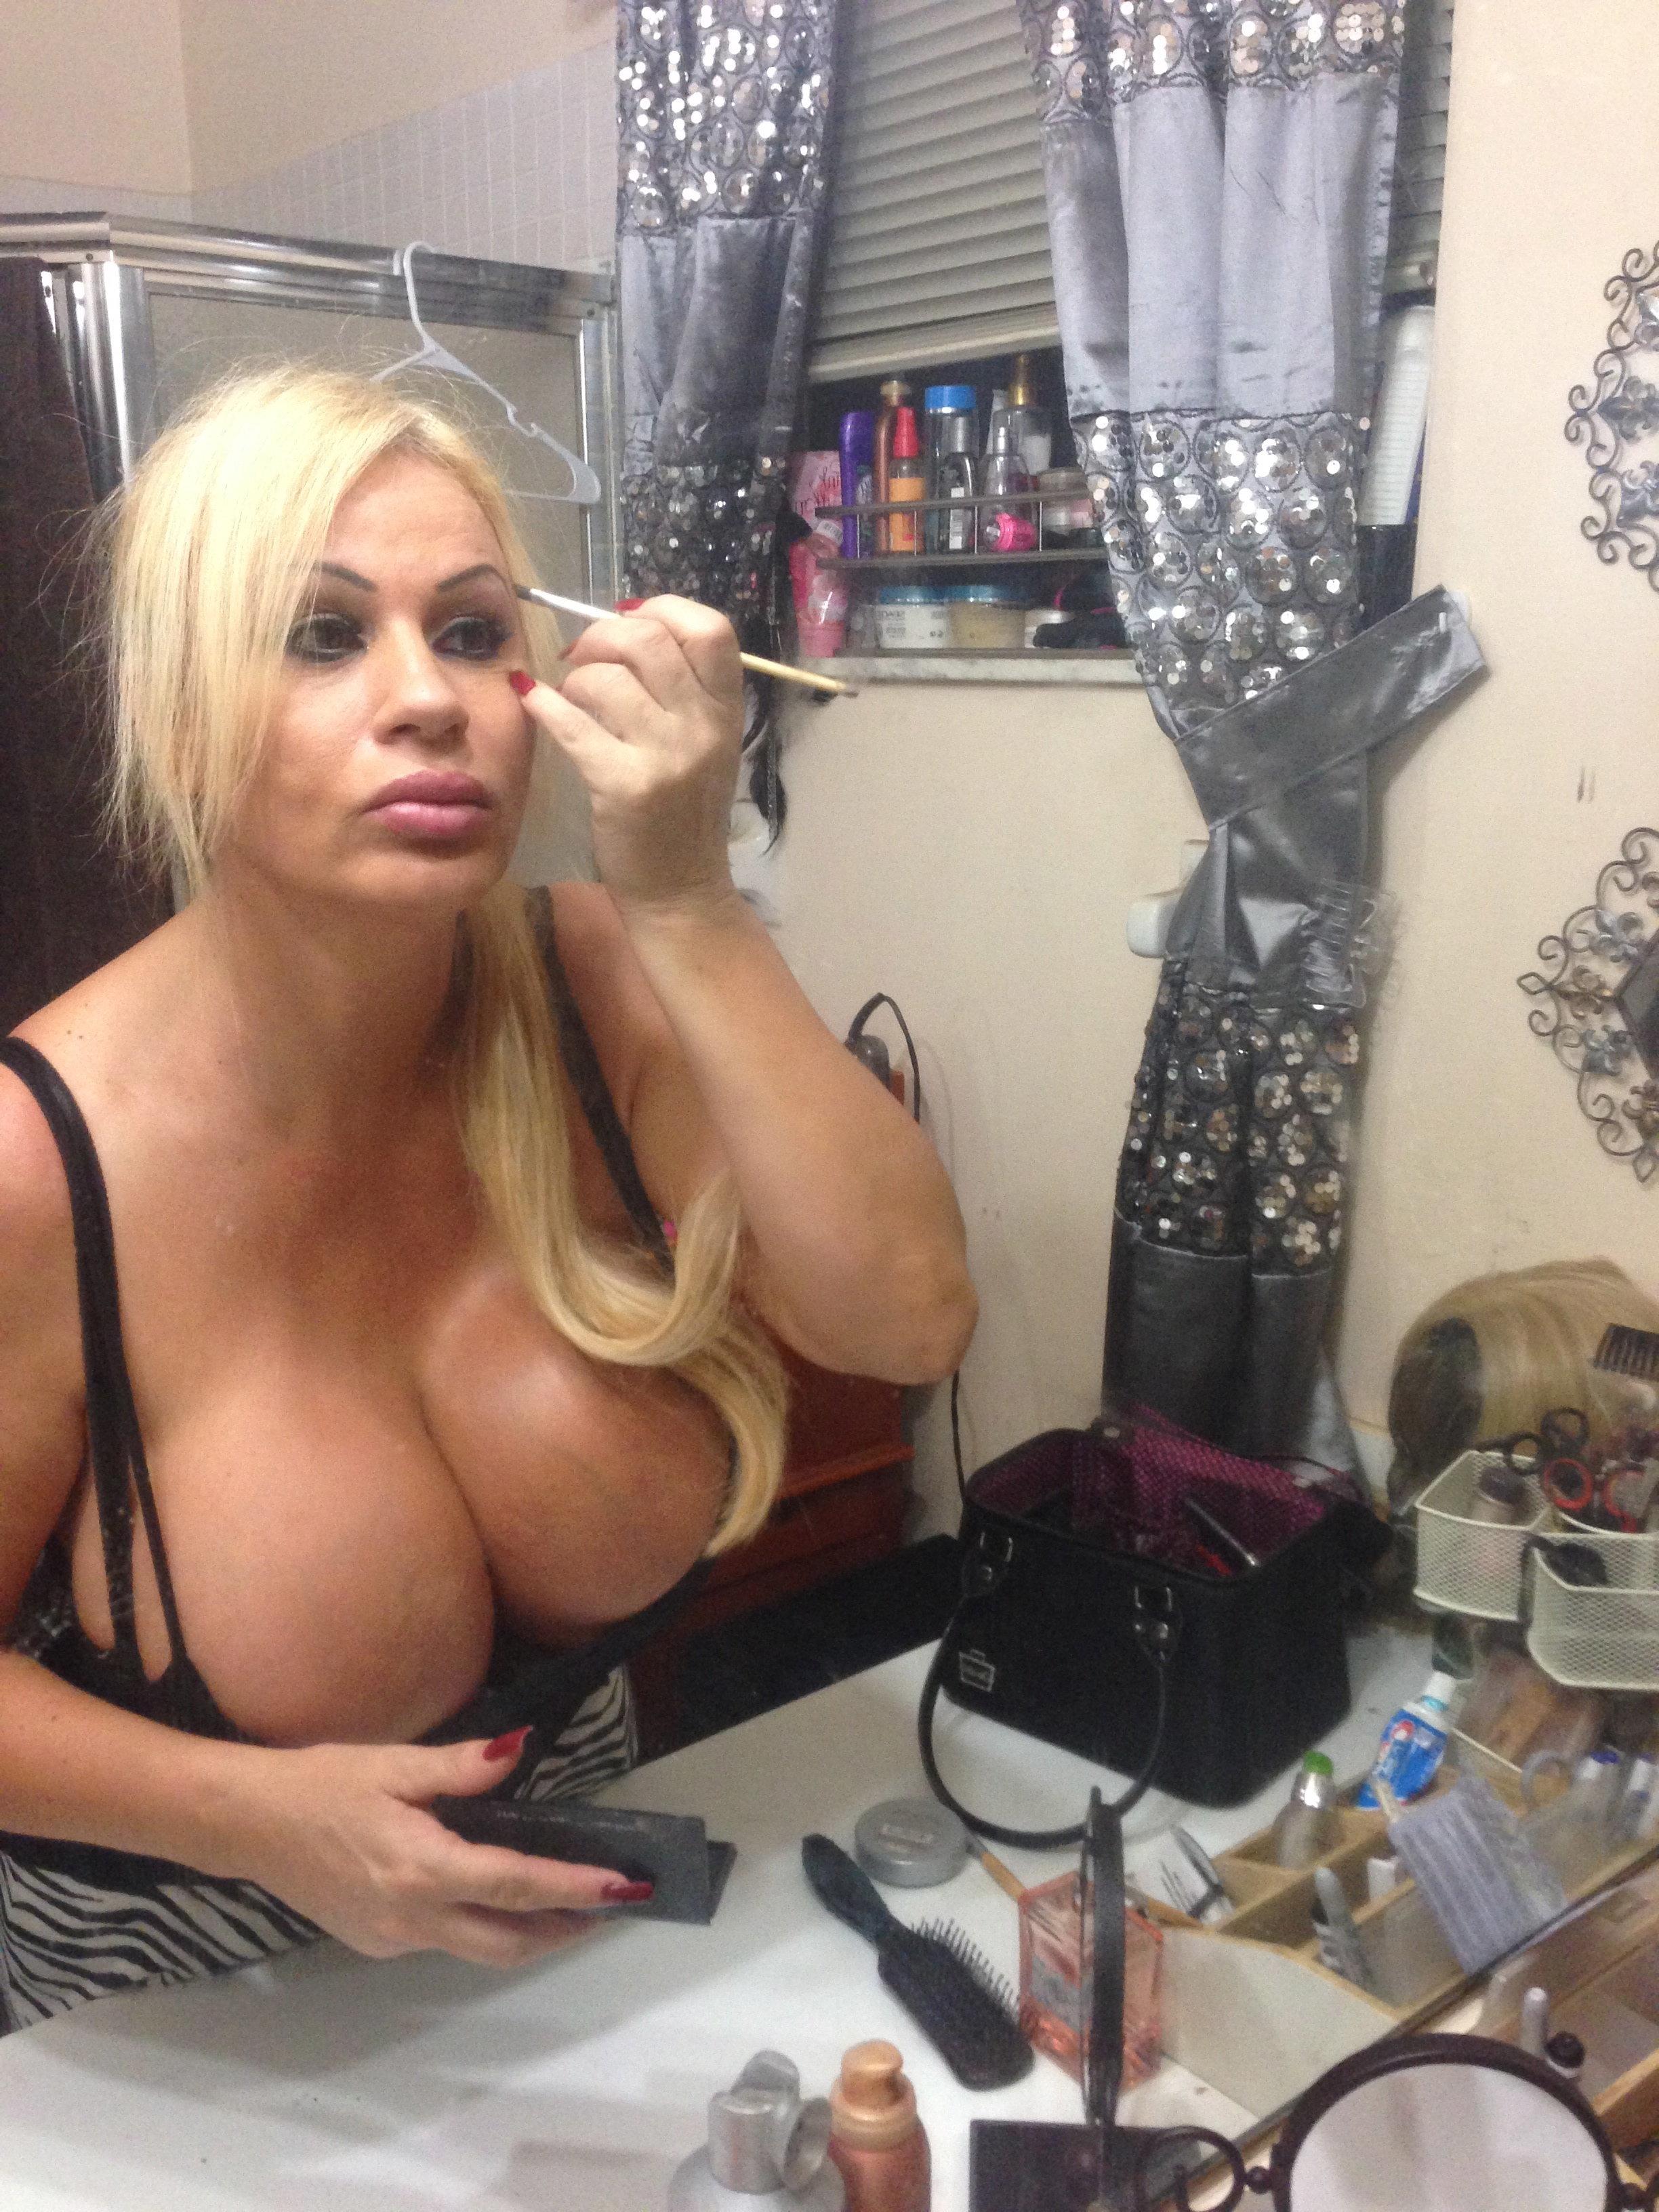 Mmm breast size